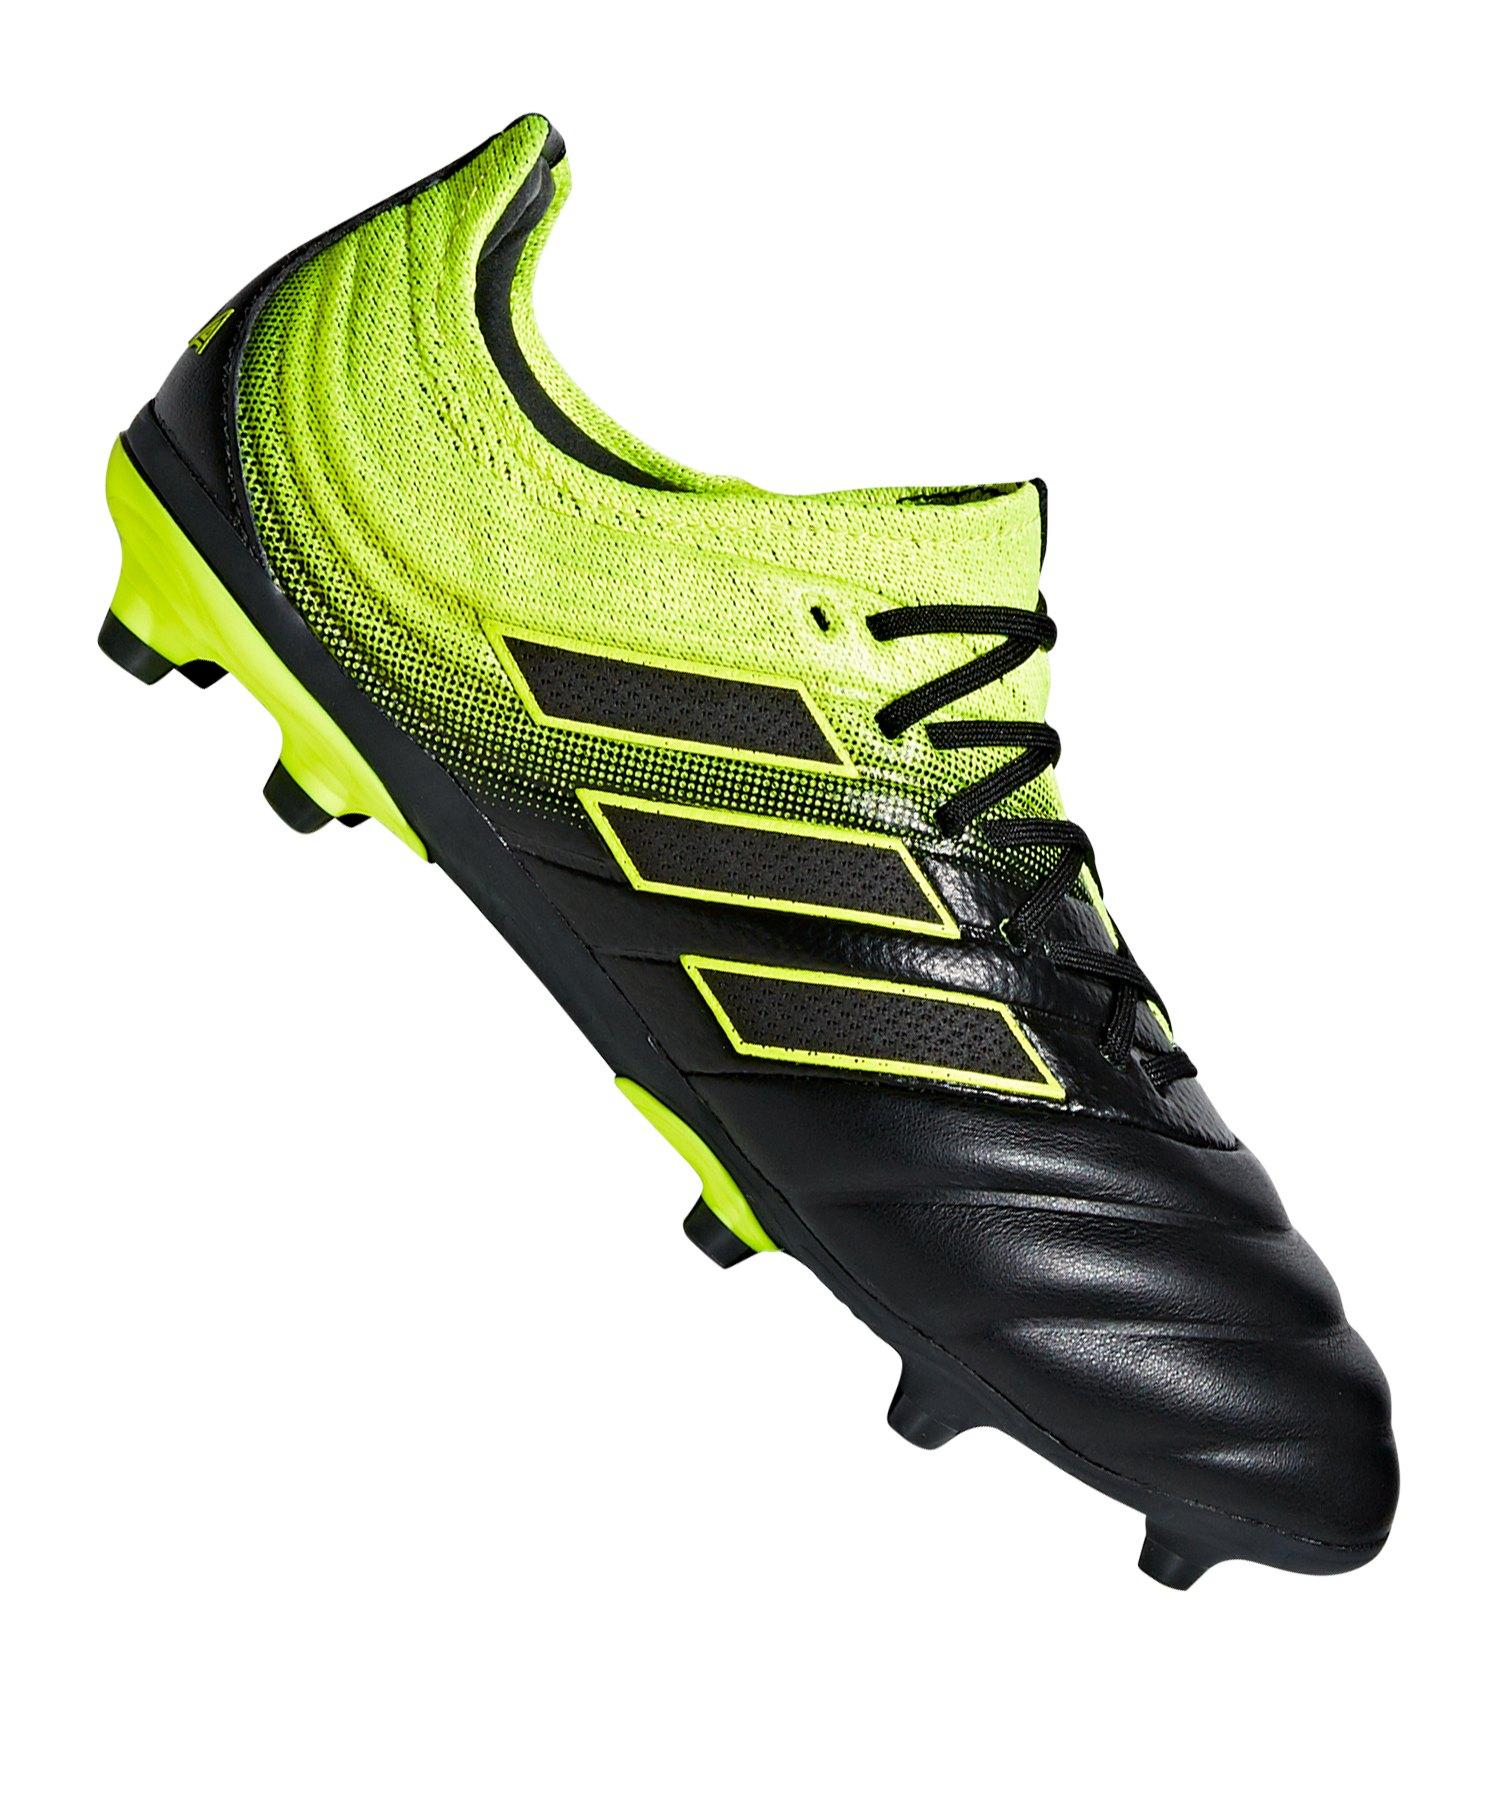 cheap for discount f56c8 12761 adidas COPA 19.1 FG J Kids Schwarz Gelb - schwarz